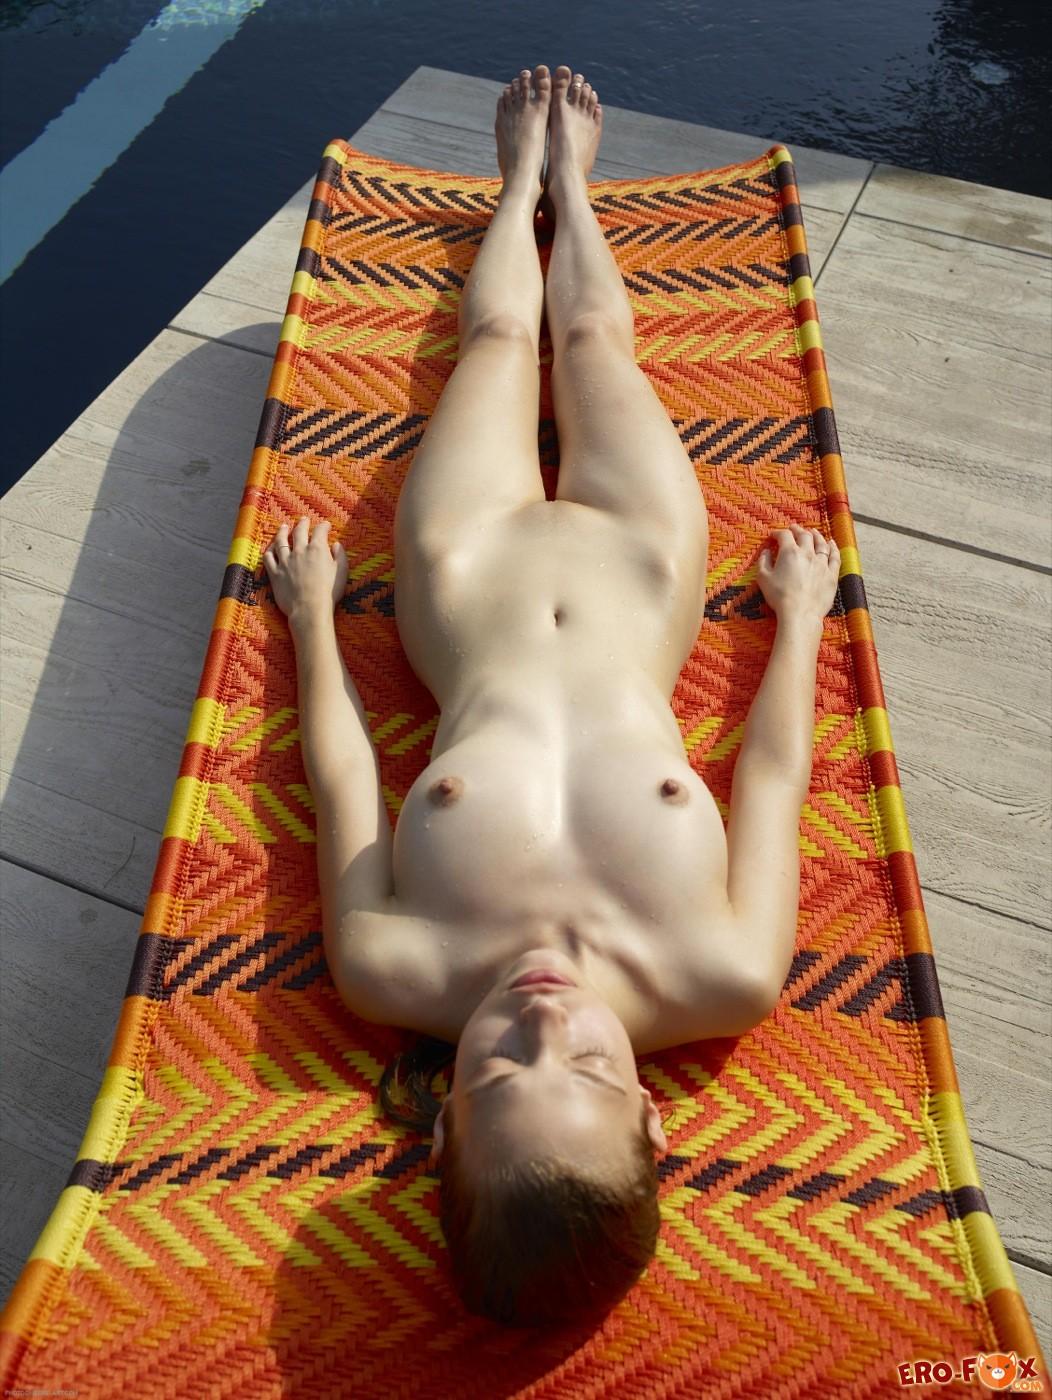 Мокрая девушка голая загорает на шезлонге - фото